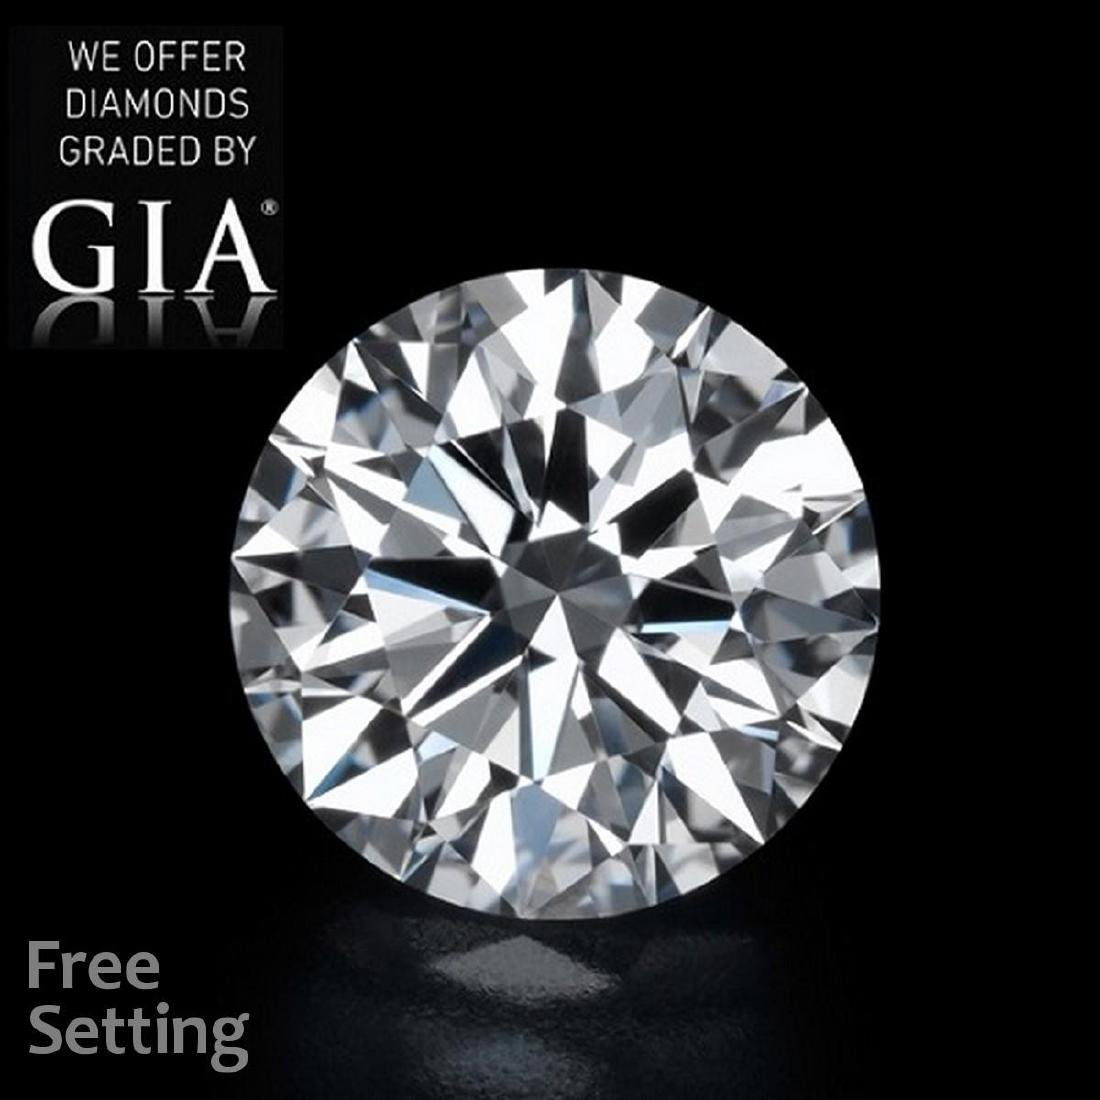 2.01 ct, Color D/VS1, Round cut Diamond